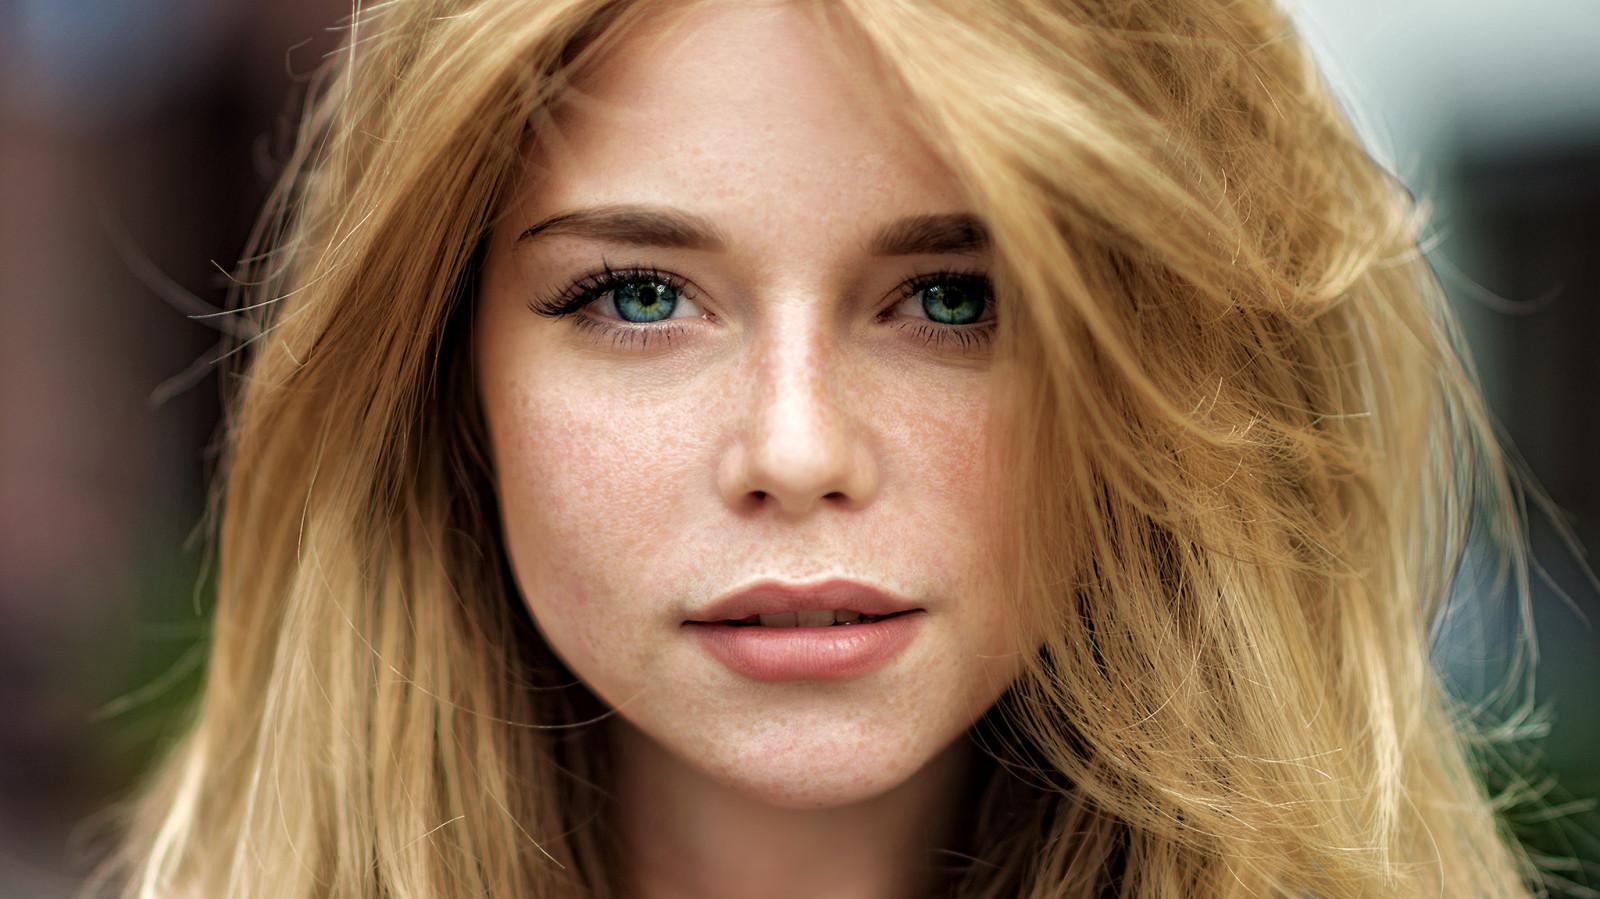 Hintergrundbilder : Frau, Gesicht, Porträt, blond, grüne